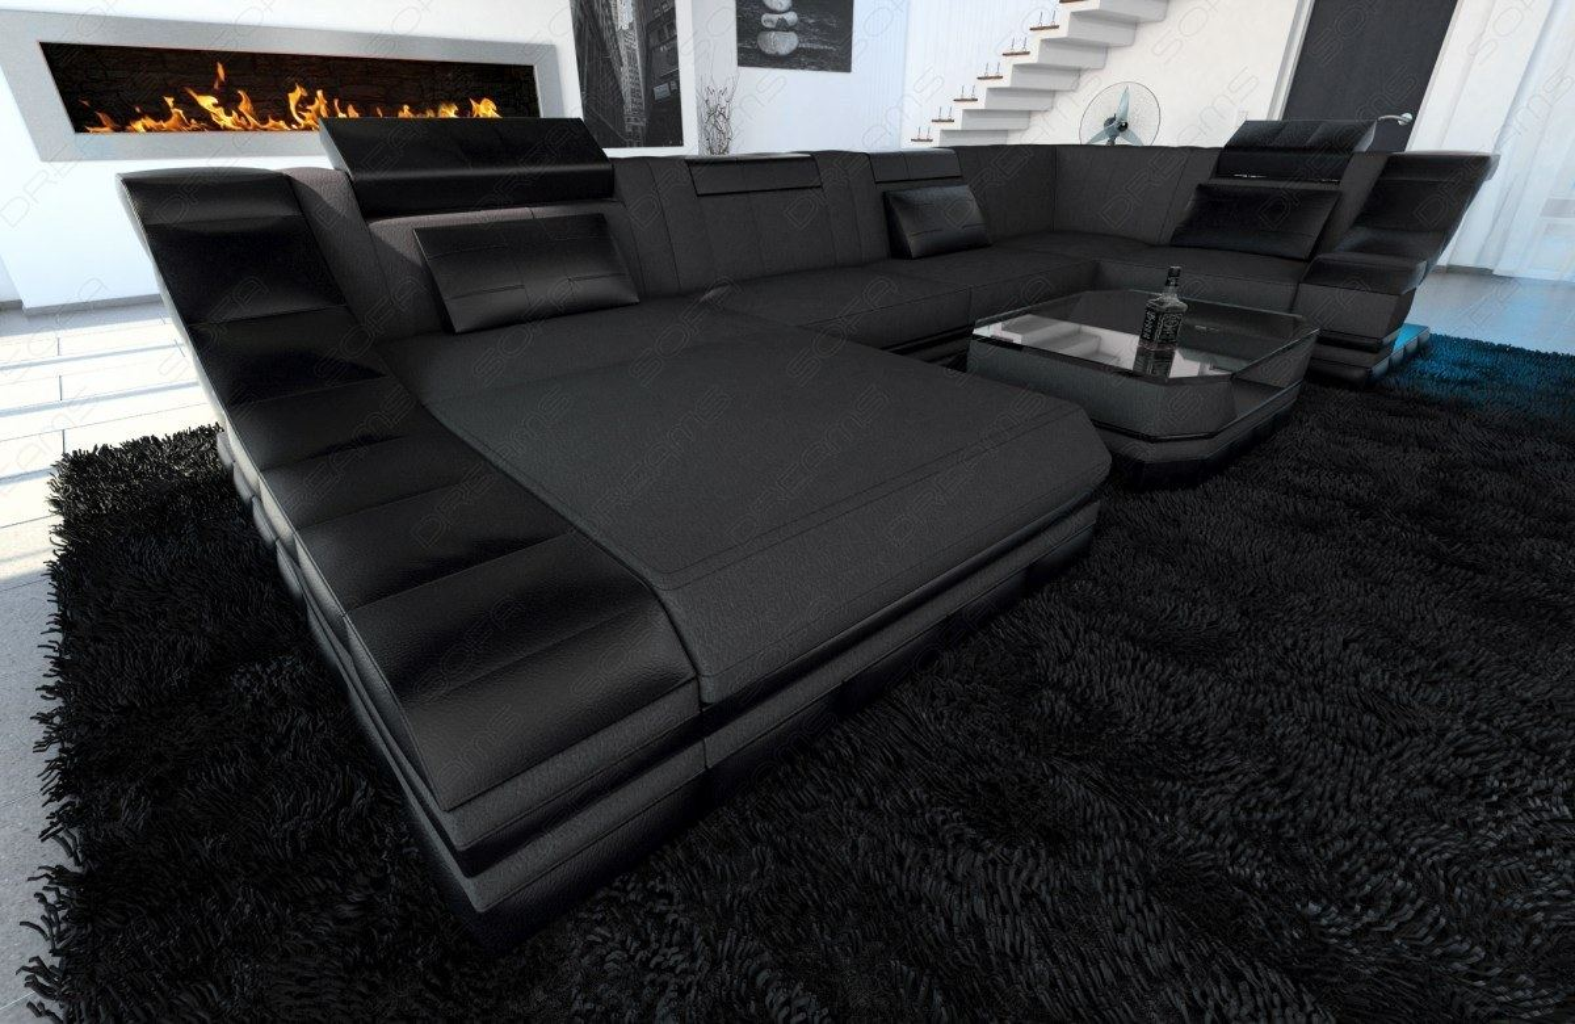 u sofa lder cool sofahusse u form marvellous inspiration l form sofa couch full size of u with. Black Bedroom Furniture Sets. Home Design Ideas